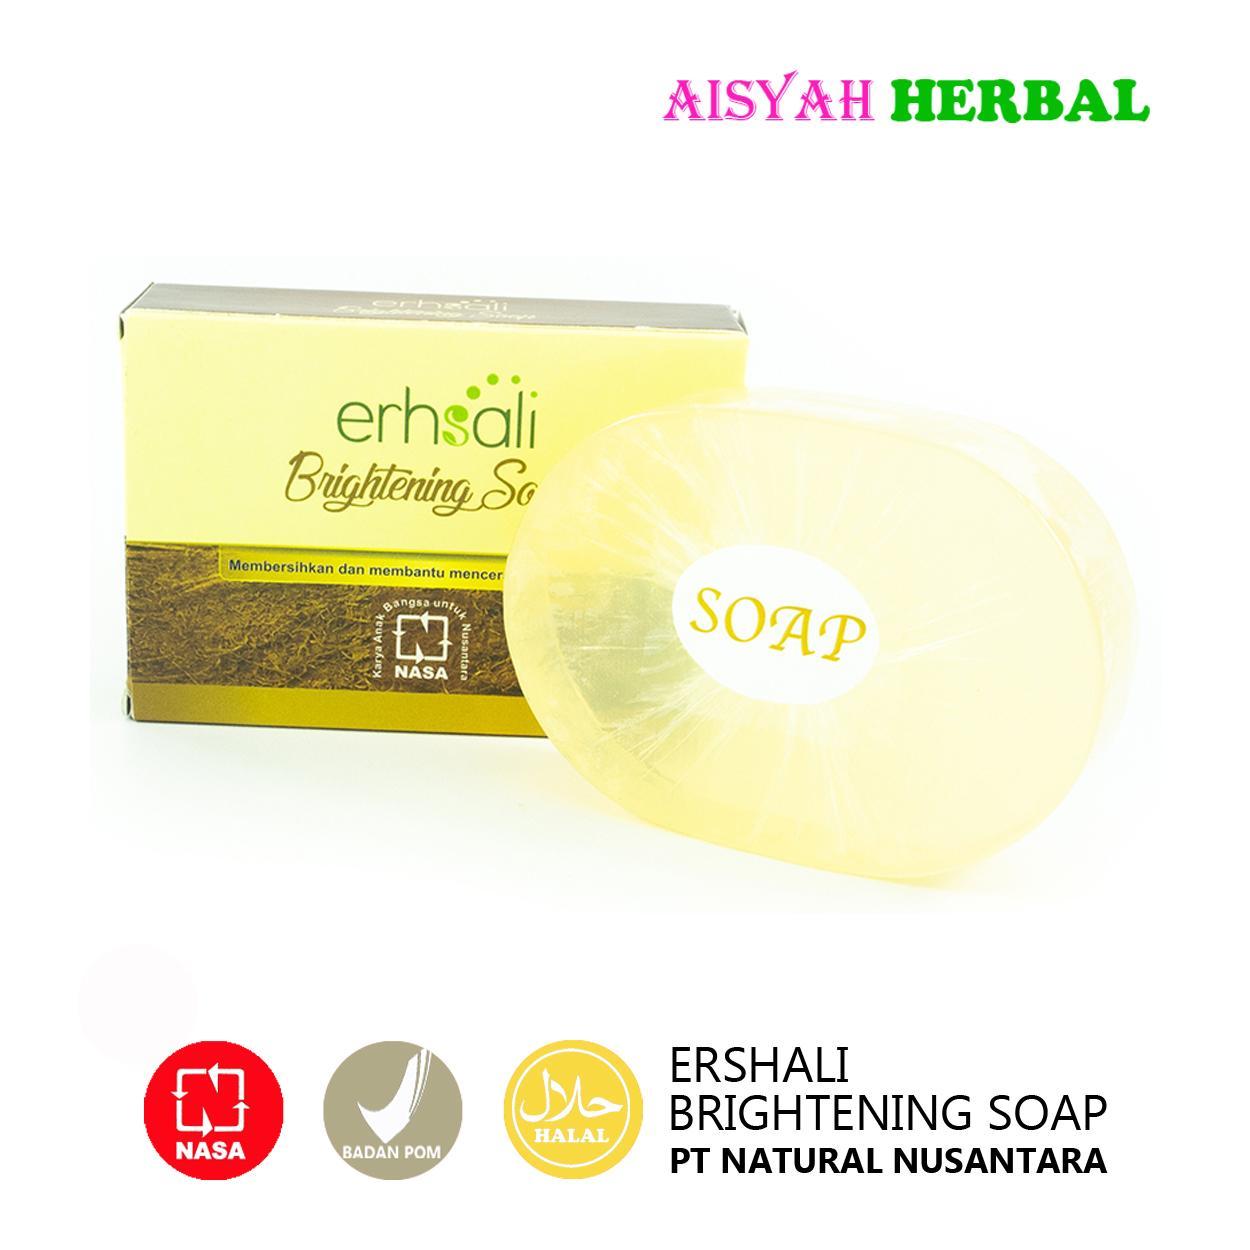 Ershali Brightening Soap Sabun Pencerah & Pemutih Kulit Muka Asli NASA